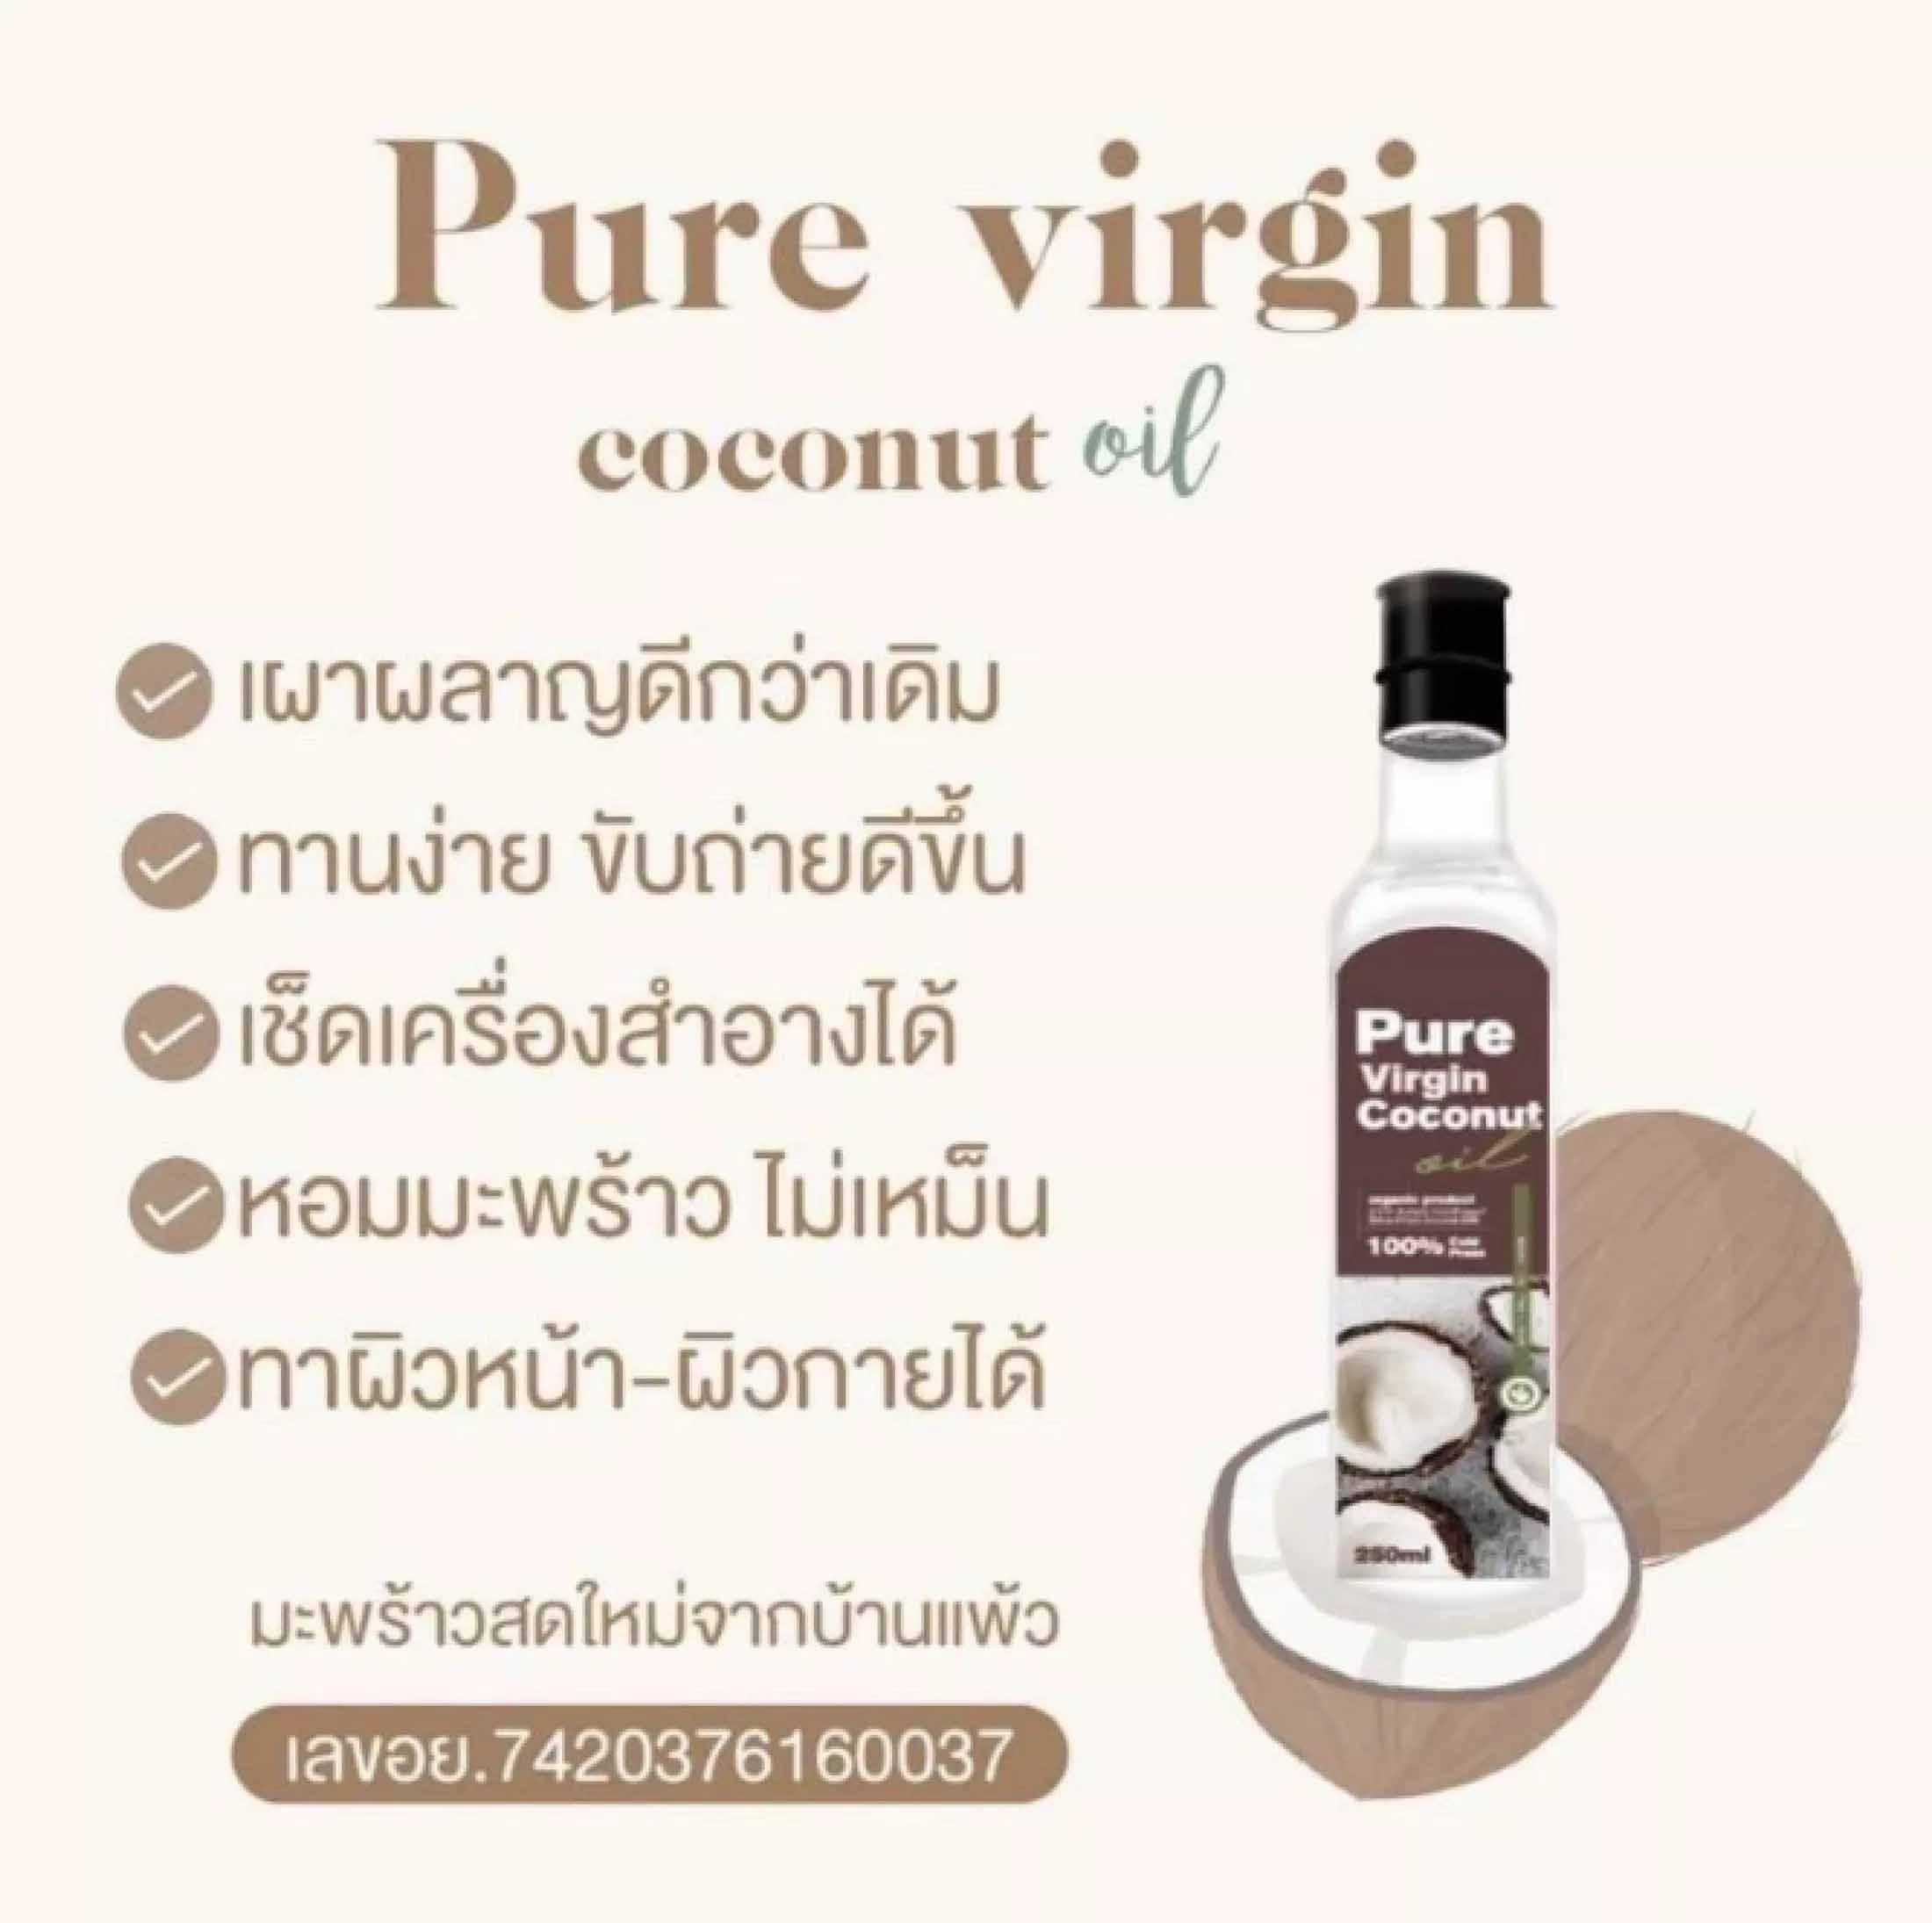 Pure virgin coconut oil 250ml น้ำมันมะพร้าวสกัดเย็น เพียวเวอร์จิ้น น้ำมันมะพร้าวบริสุทธิ์ 100%